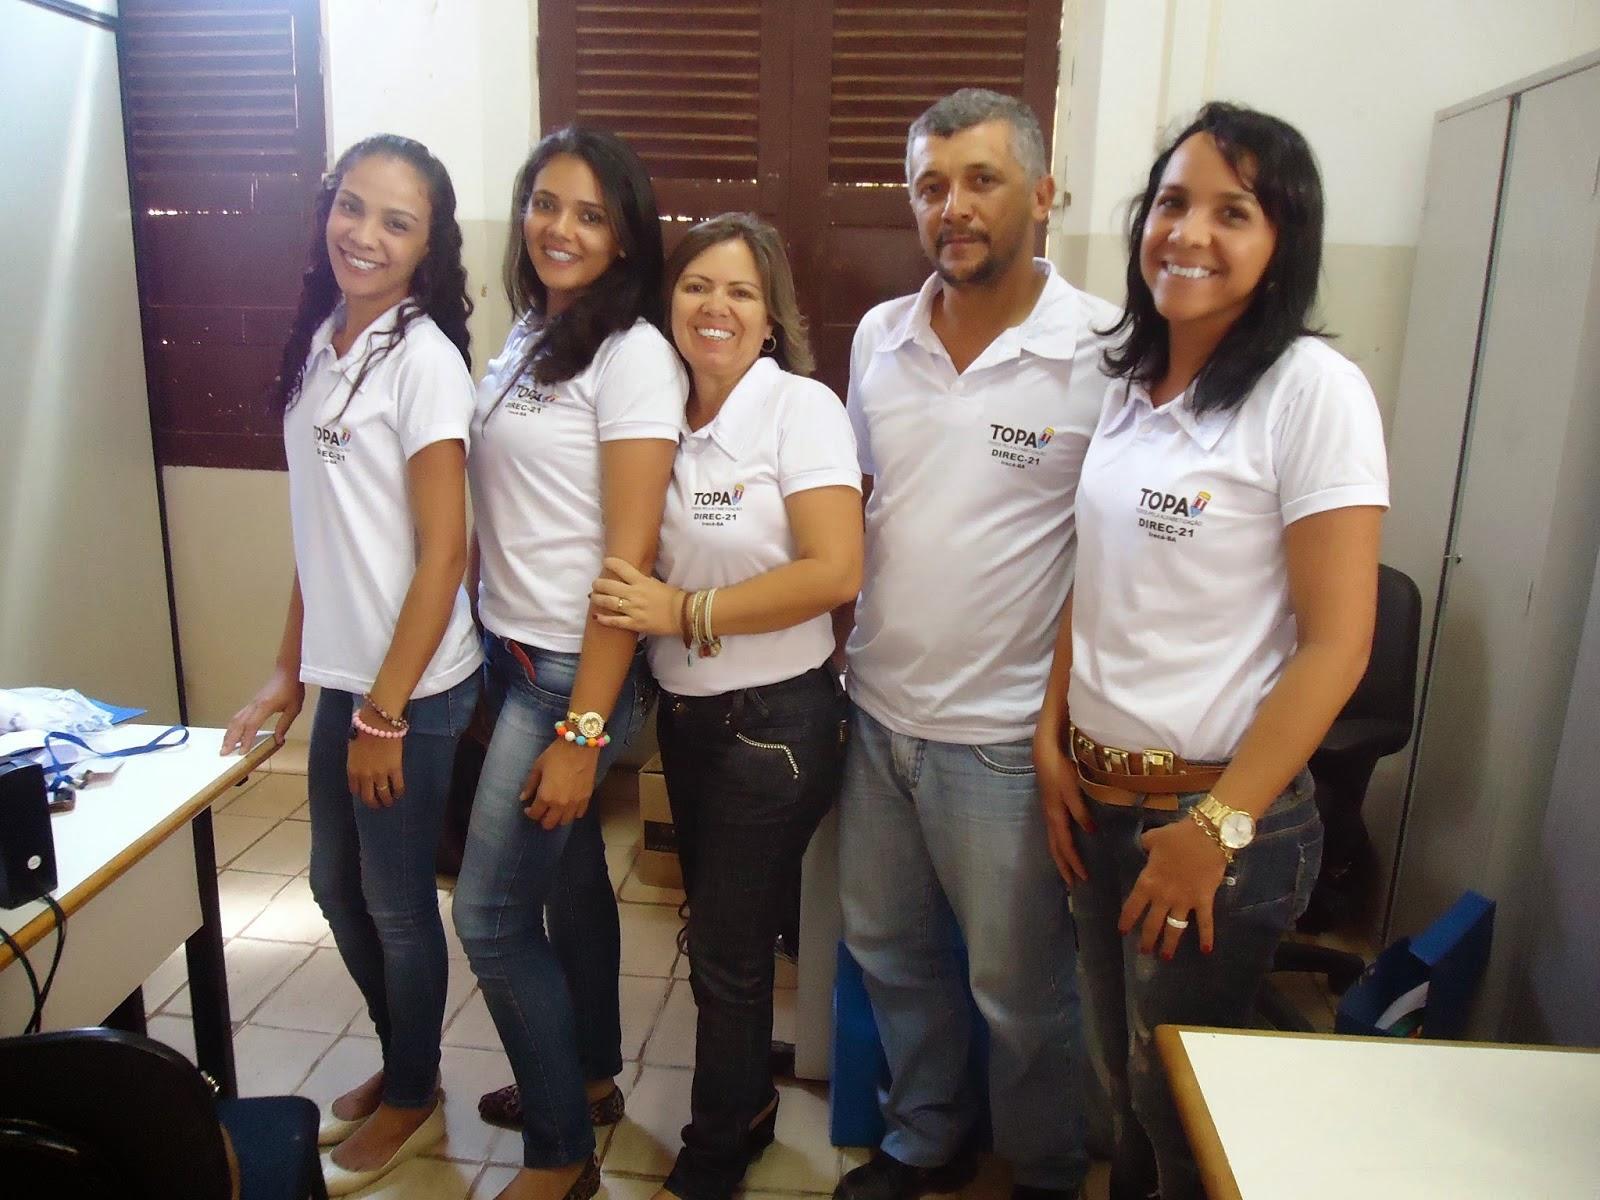 Equipe Topa 2014